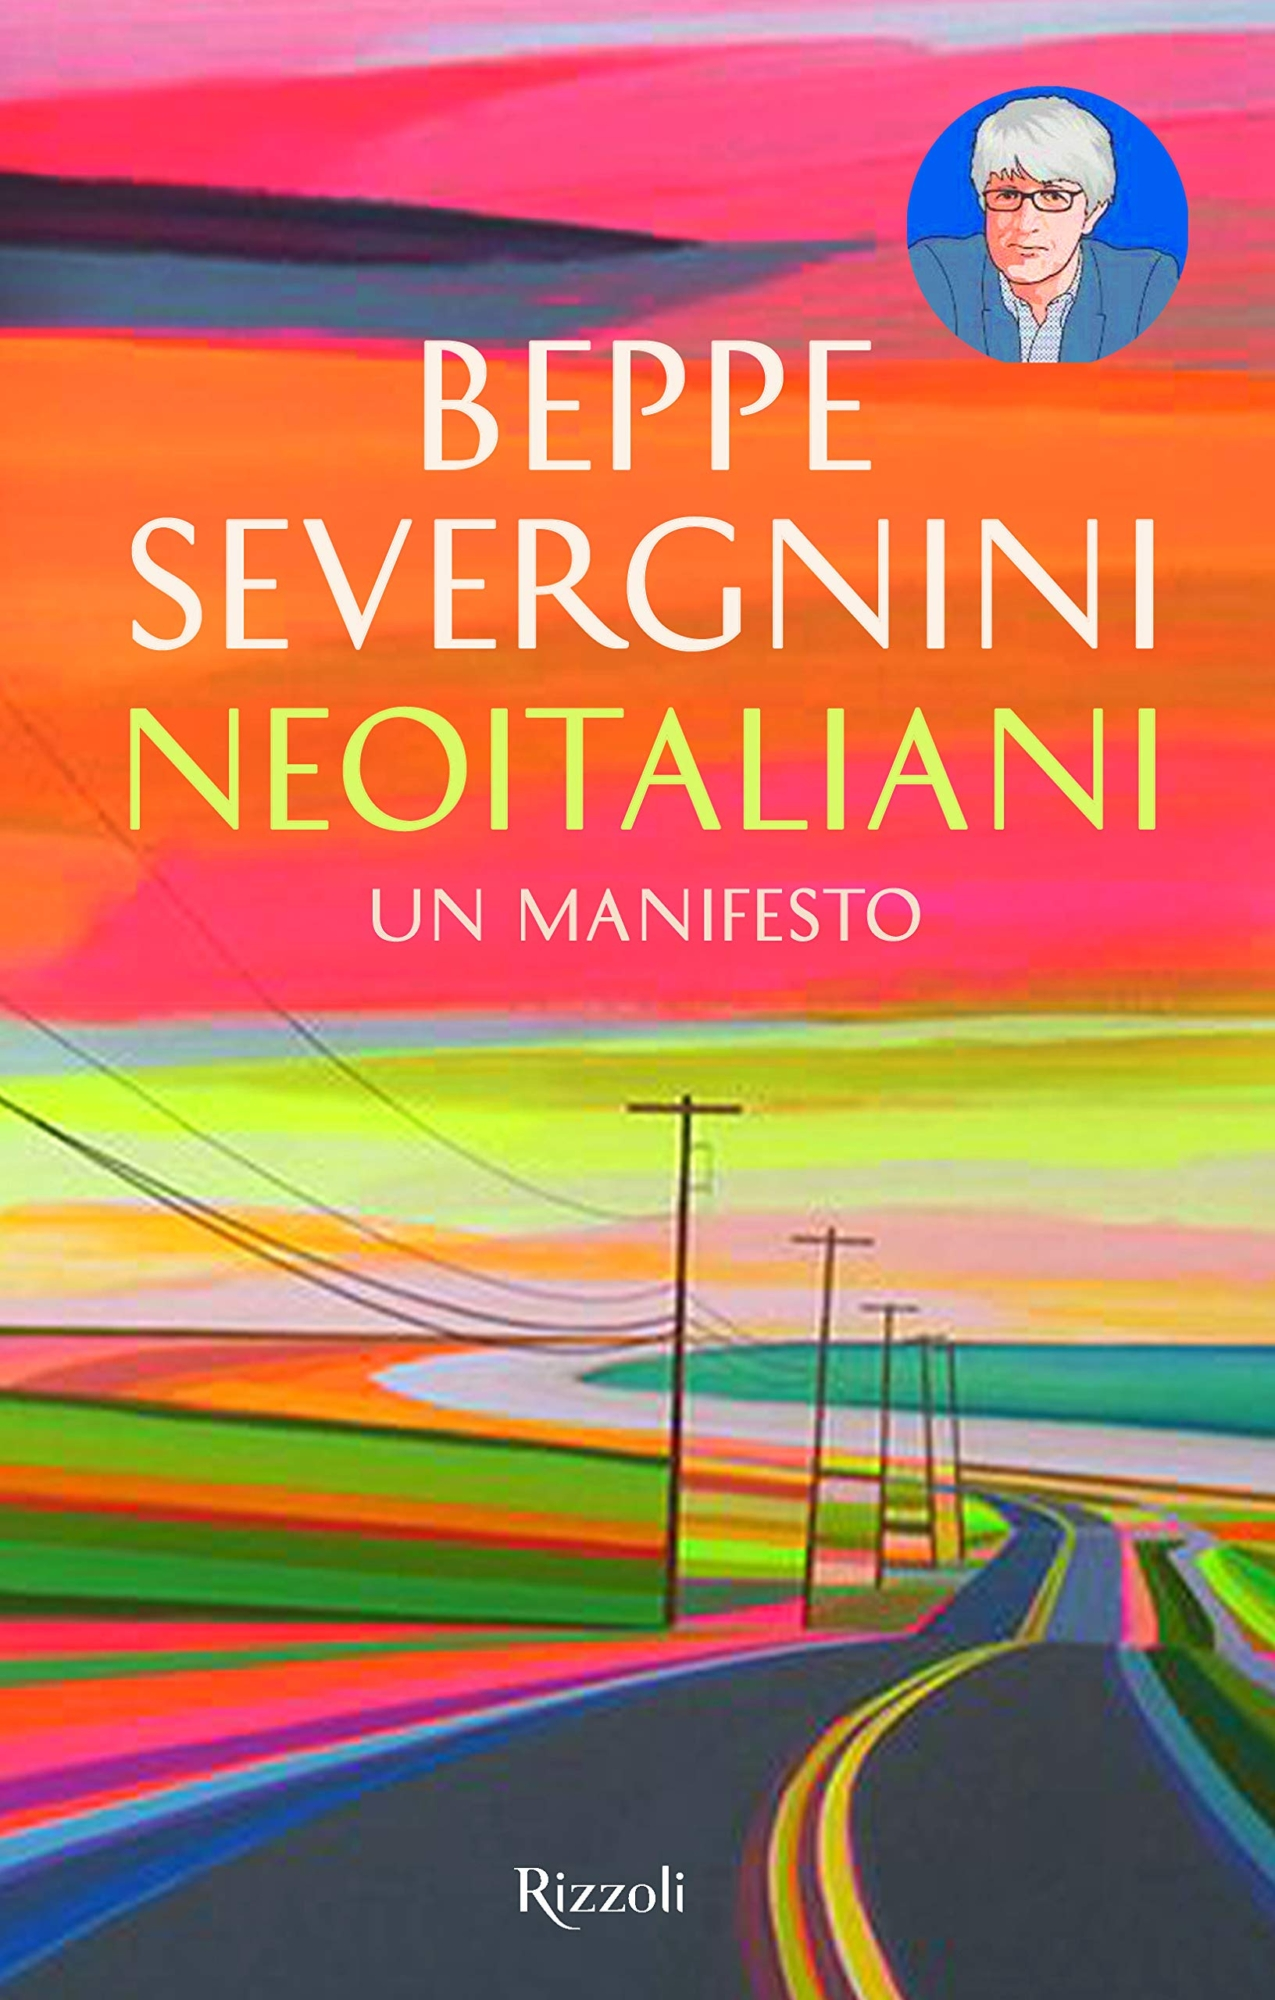 Severgnini Neoitaliani